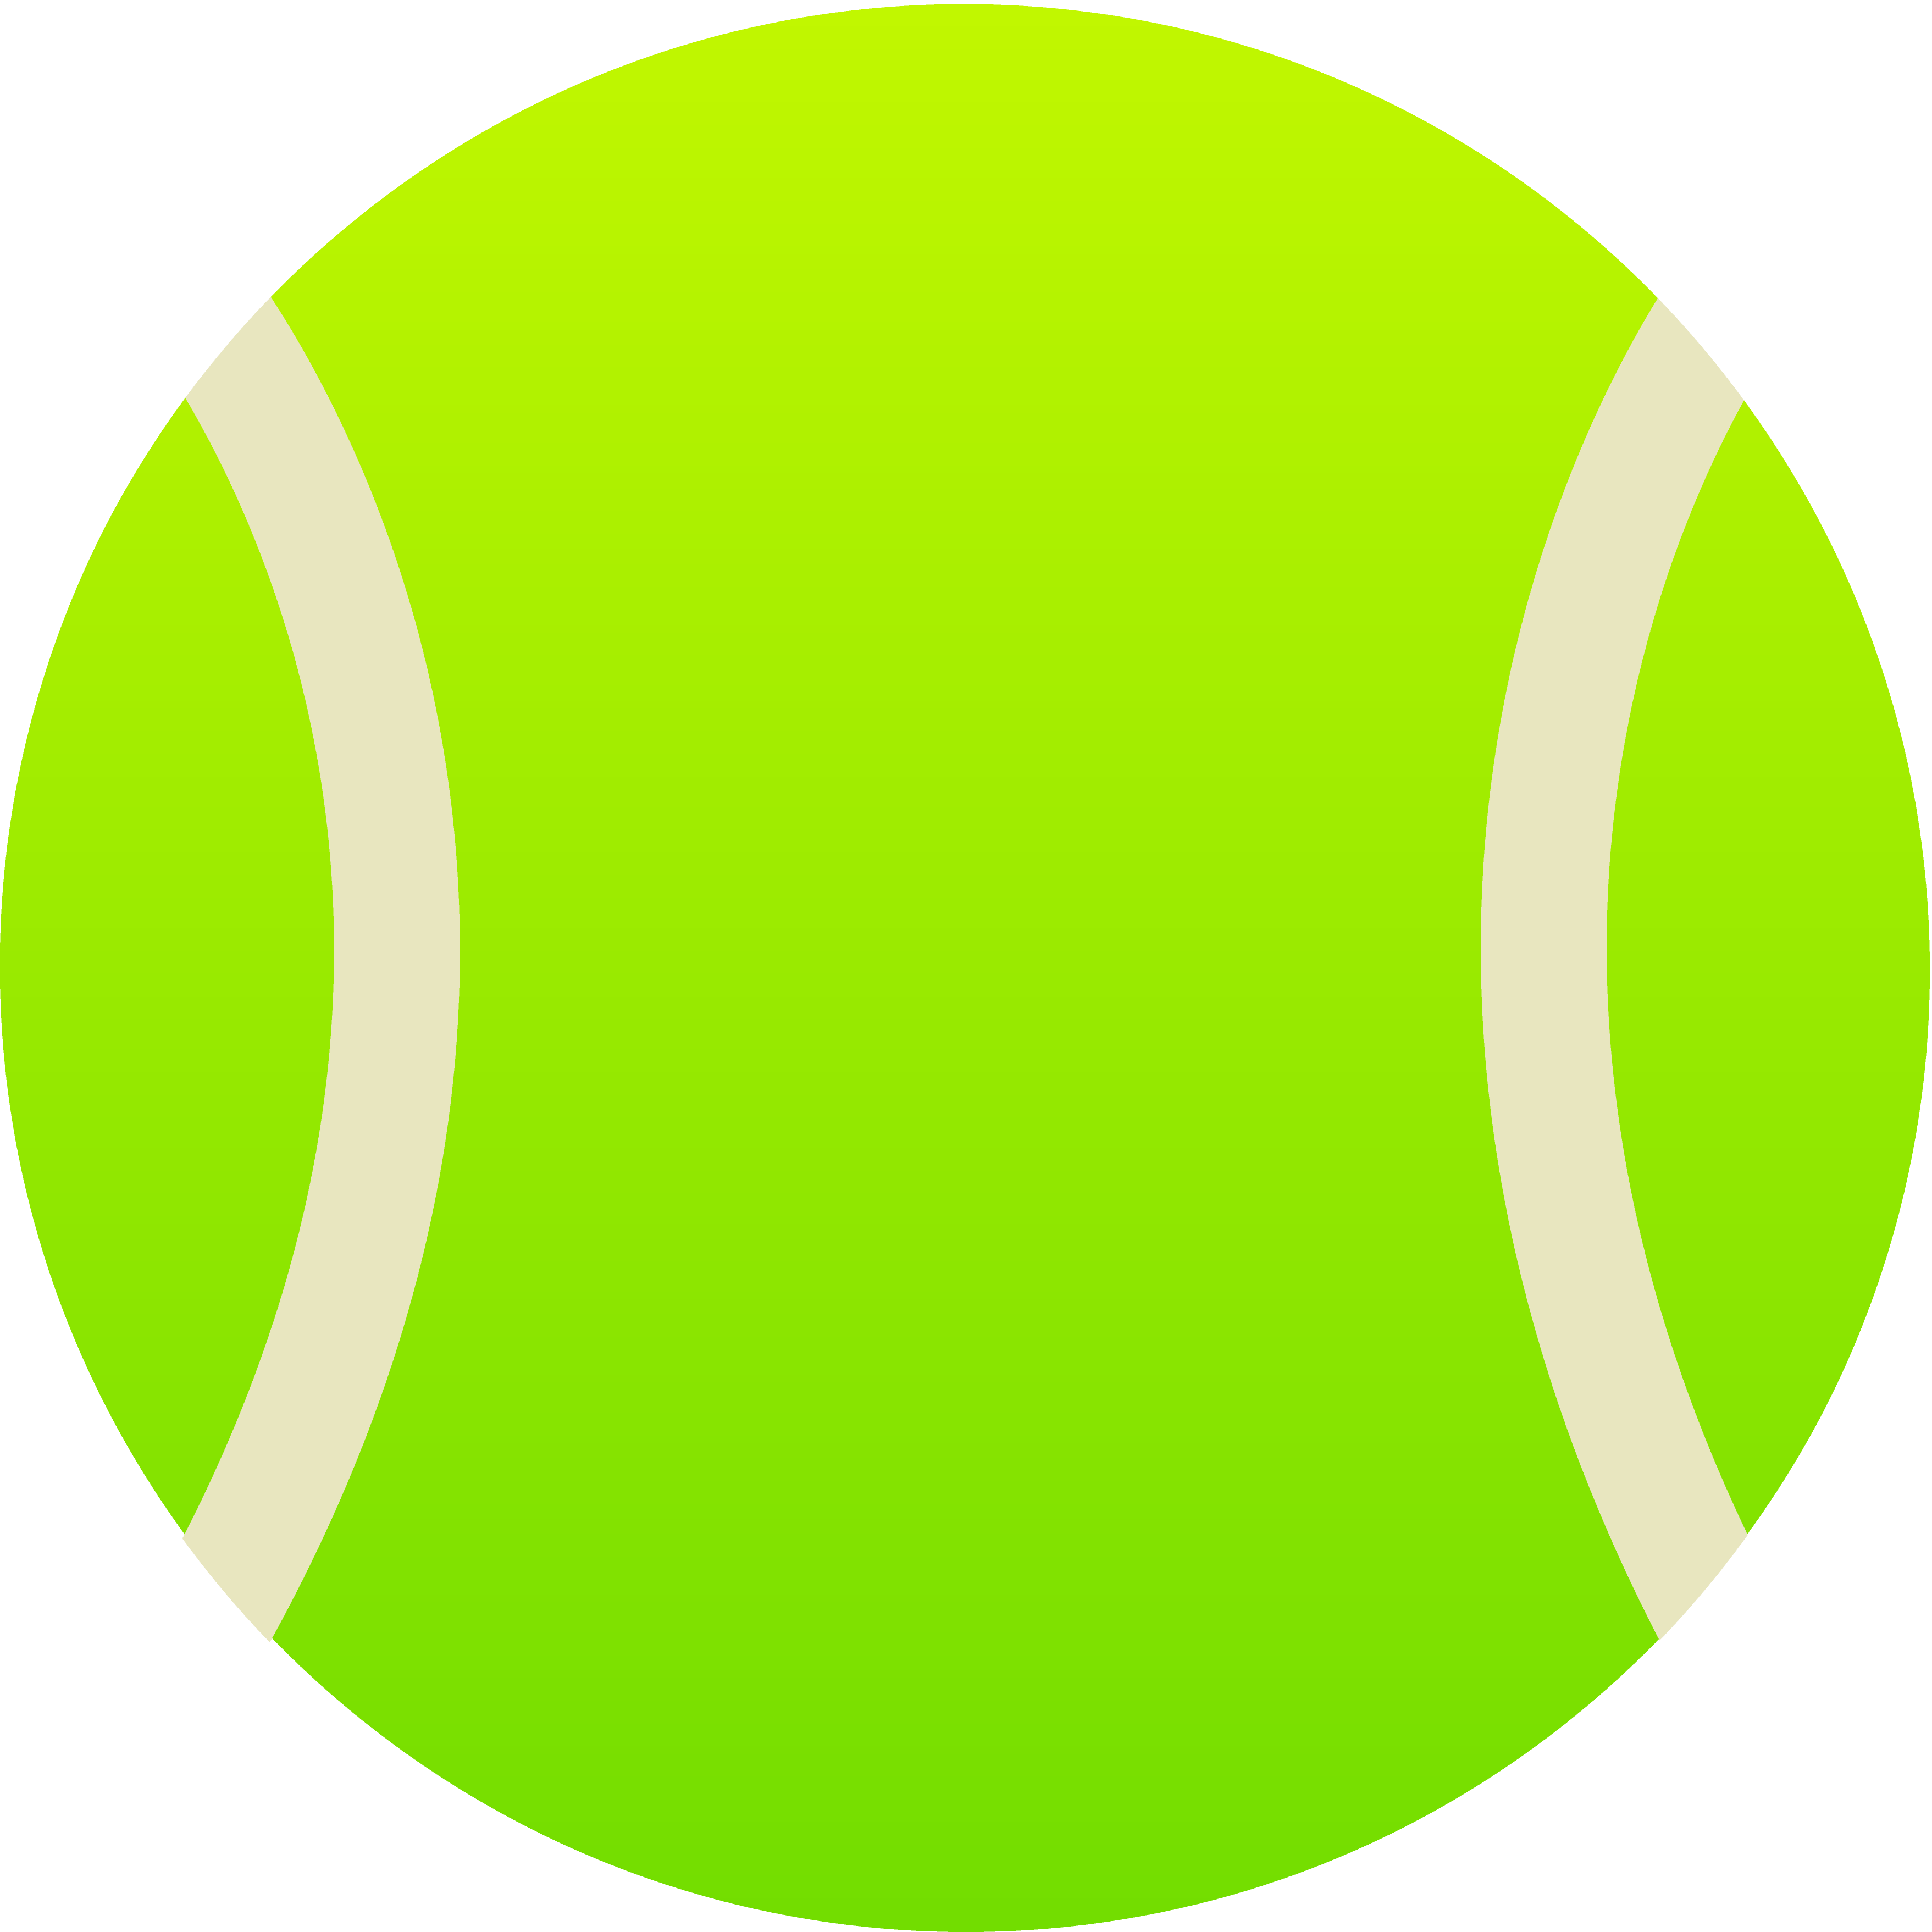 3515x3515 Simple Green Tennis Ball